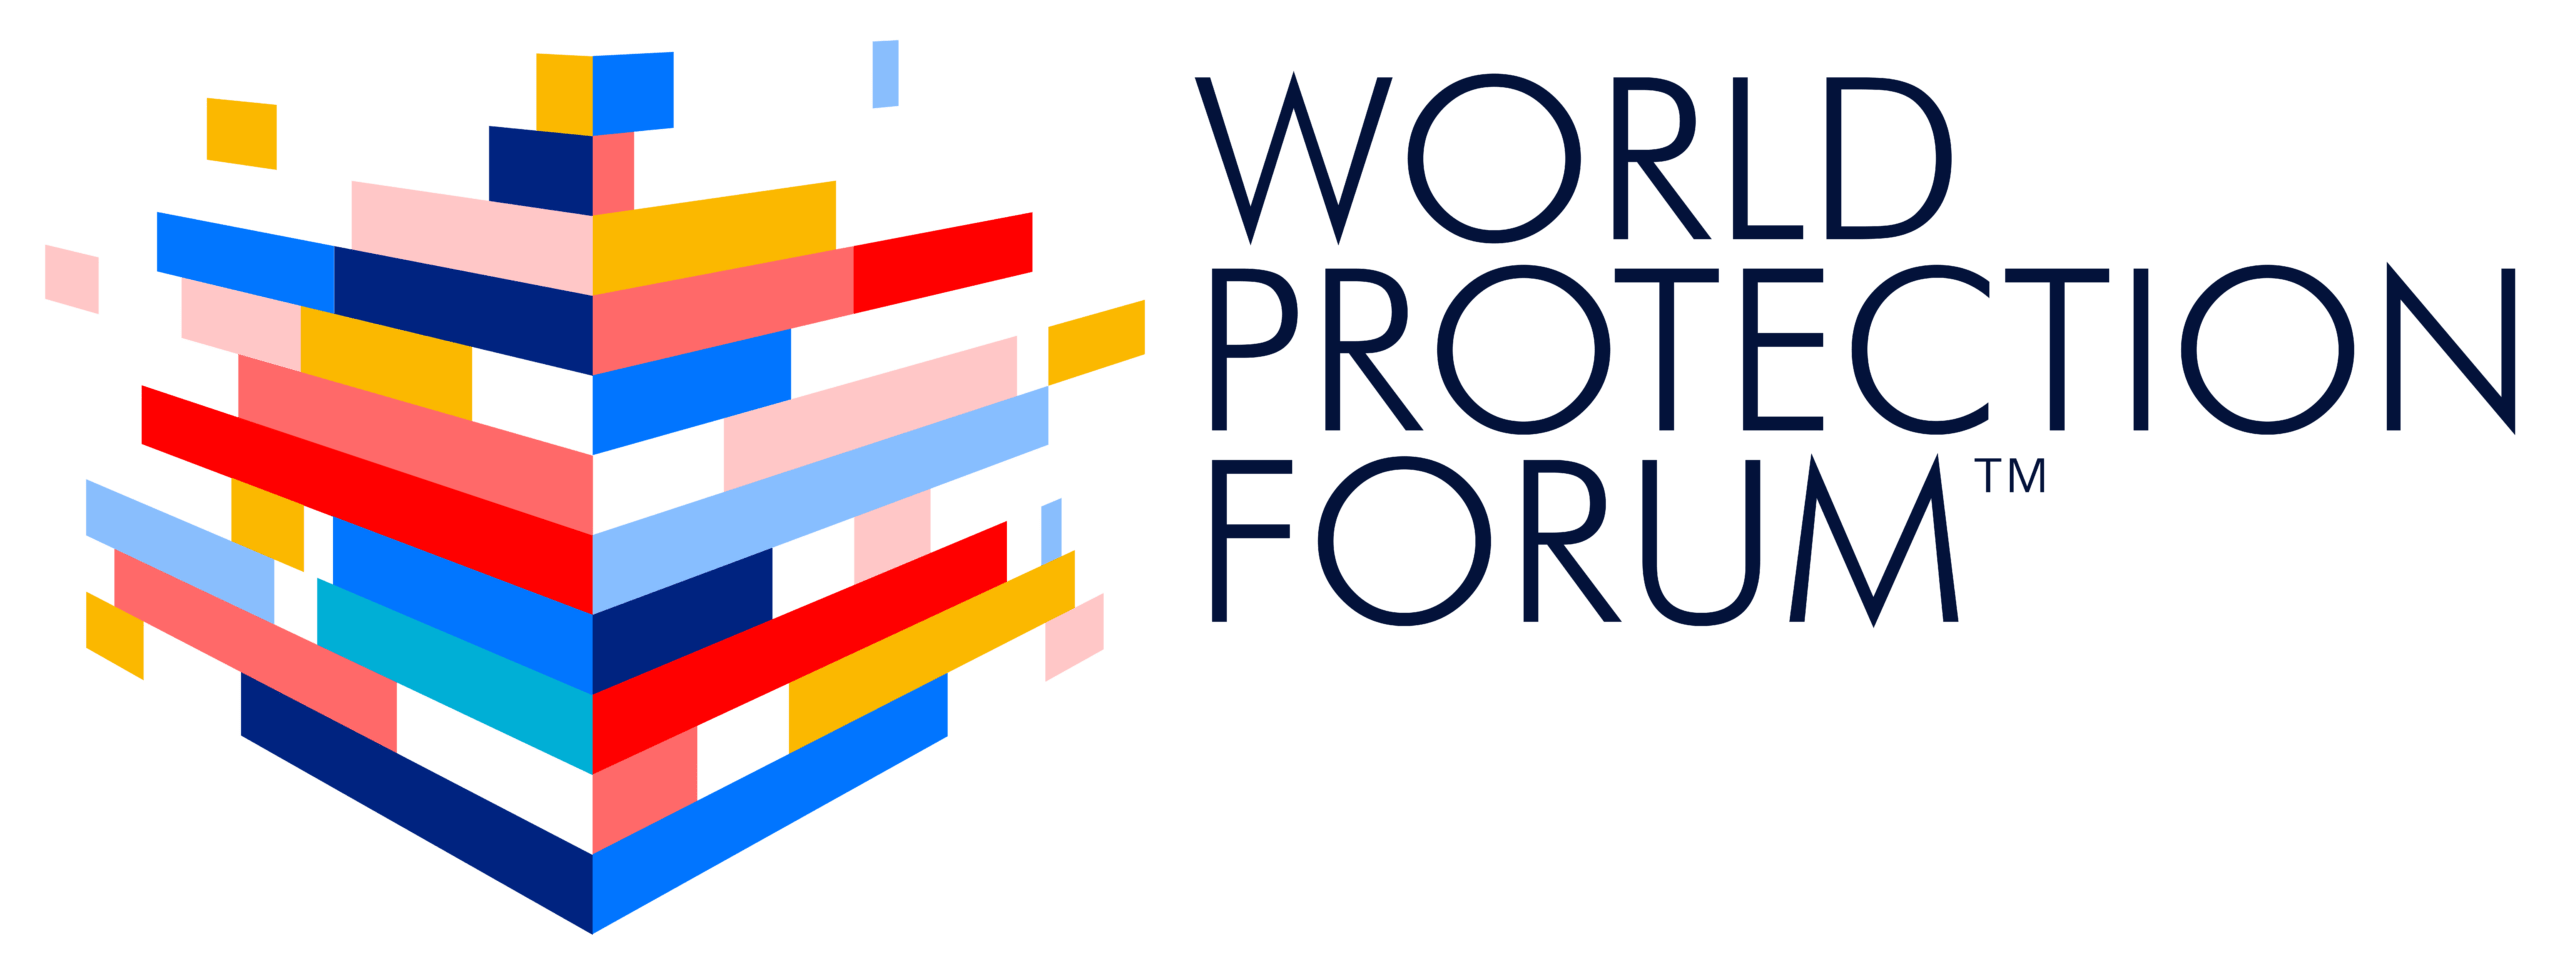 World Protection Forum™